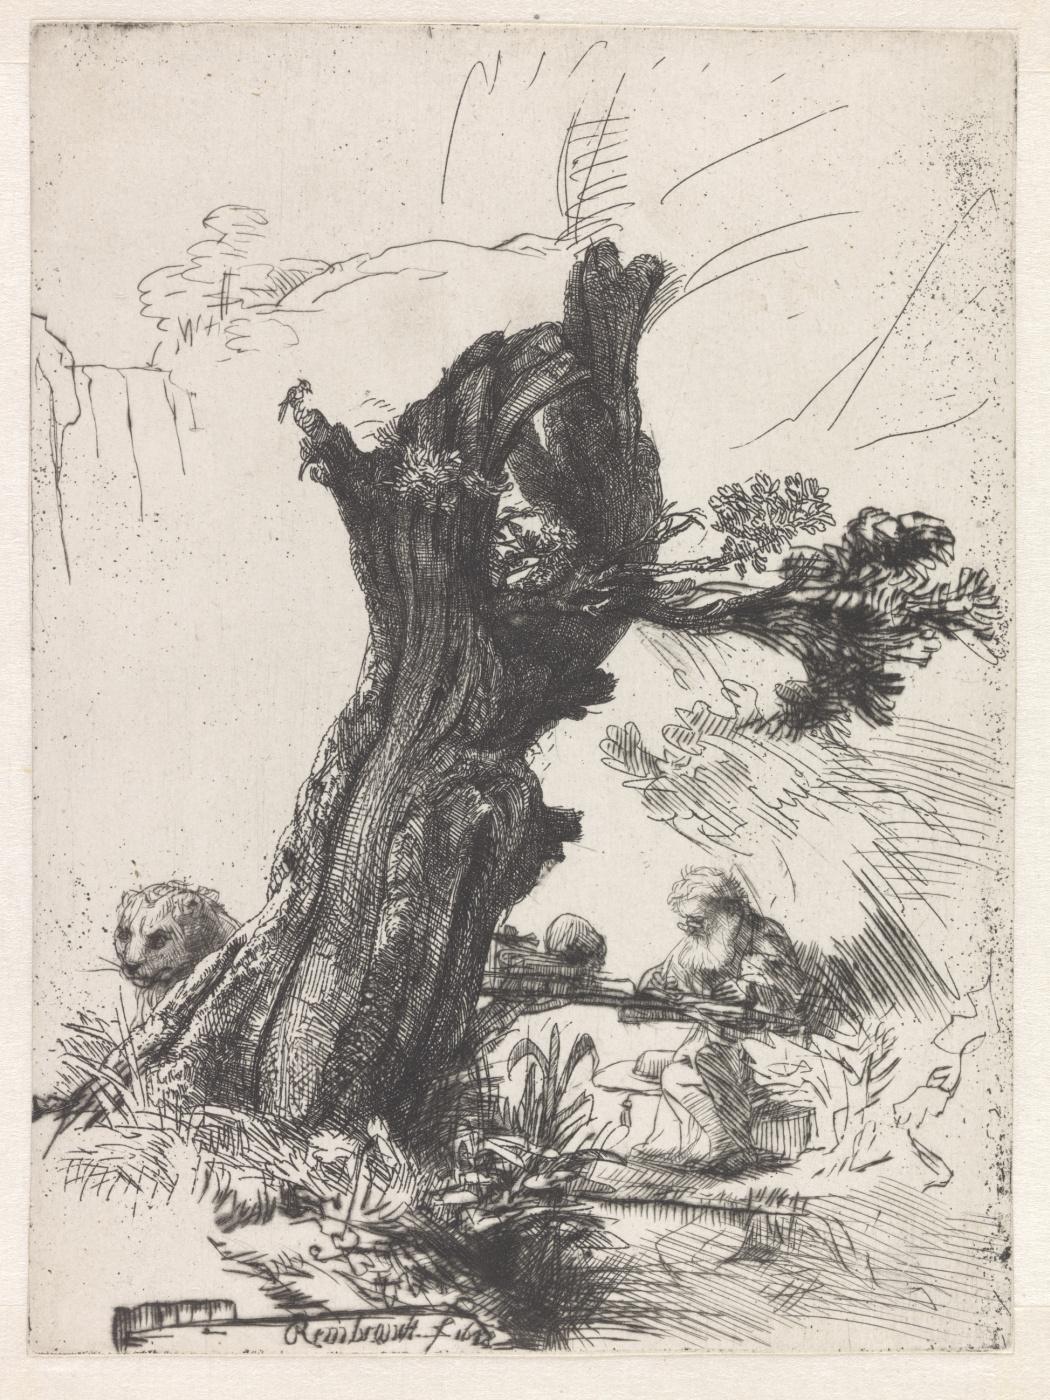 Rembrandt Harmenszoon van Rijn. St. Jerome under a willow tree